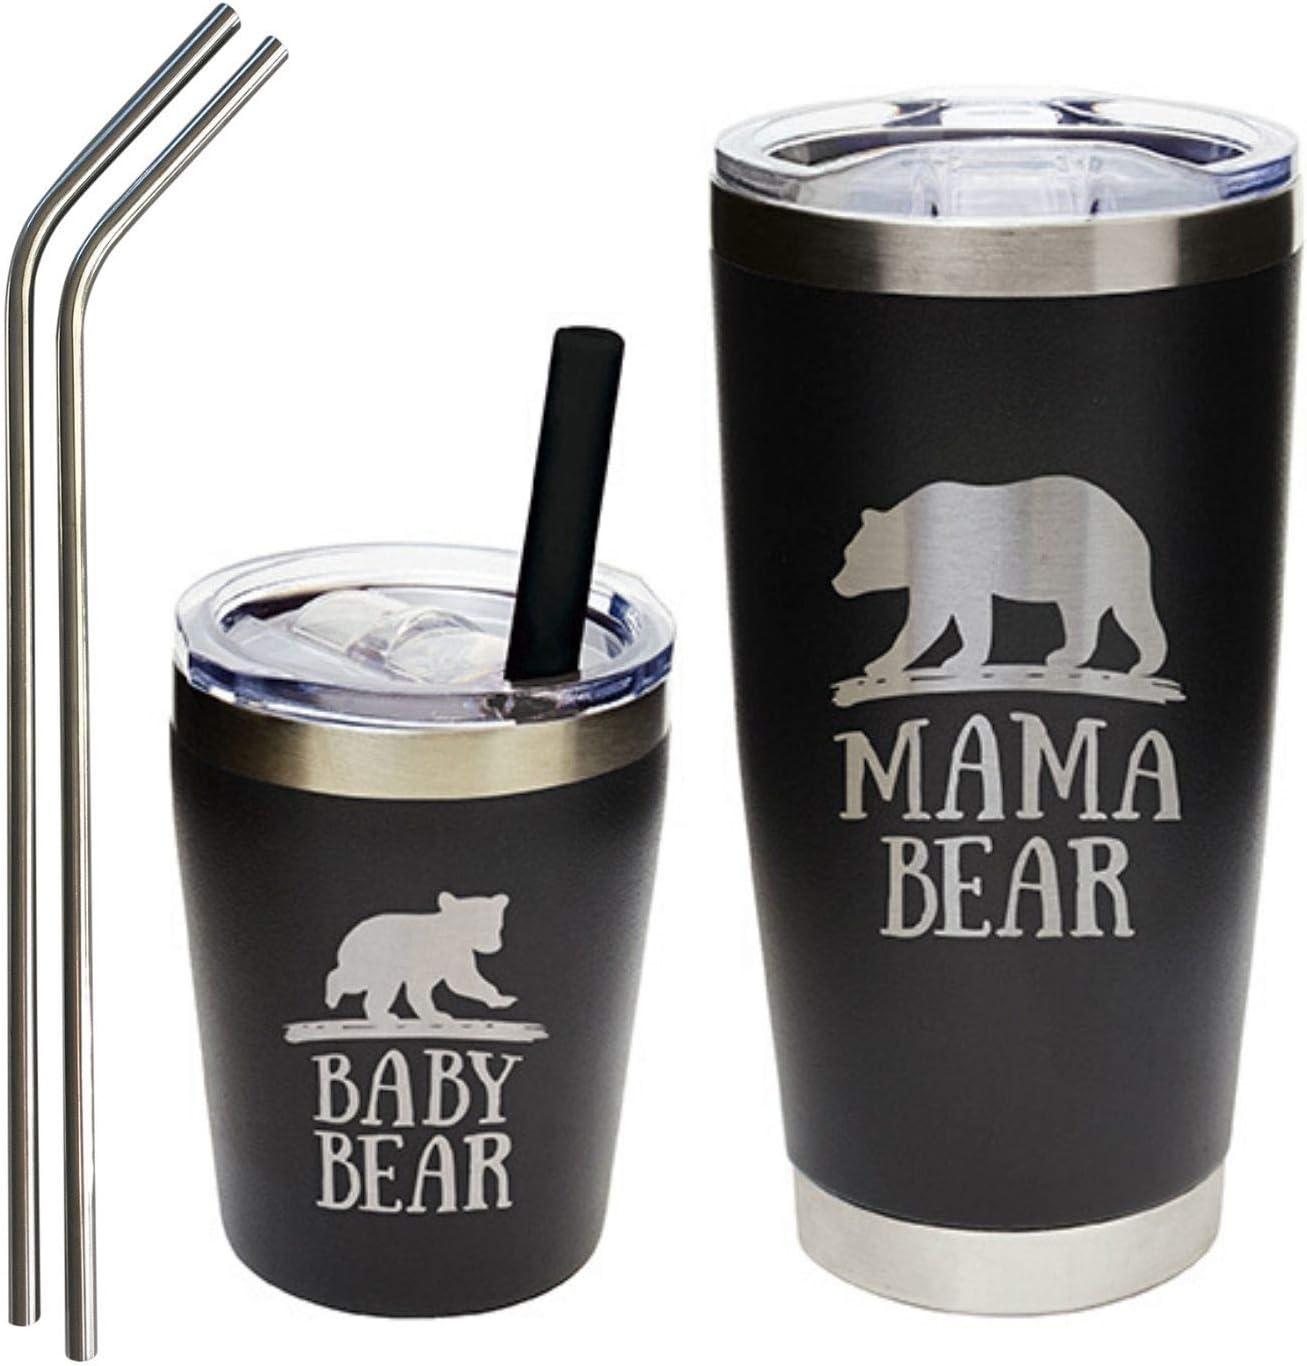 Mama Bear Rose Gold Glitter Dipped Travel Tumbler 20oz SkinnyRegular Curve Tumbler wLid and Reusable Straw